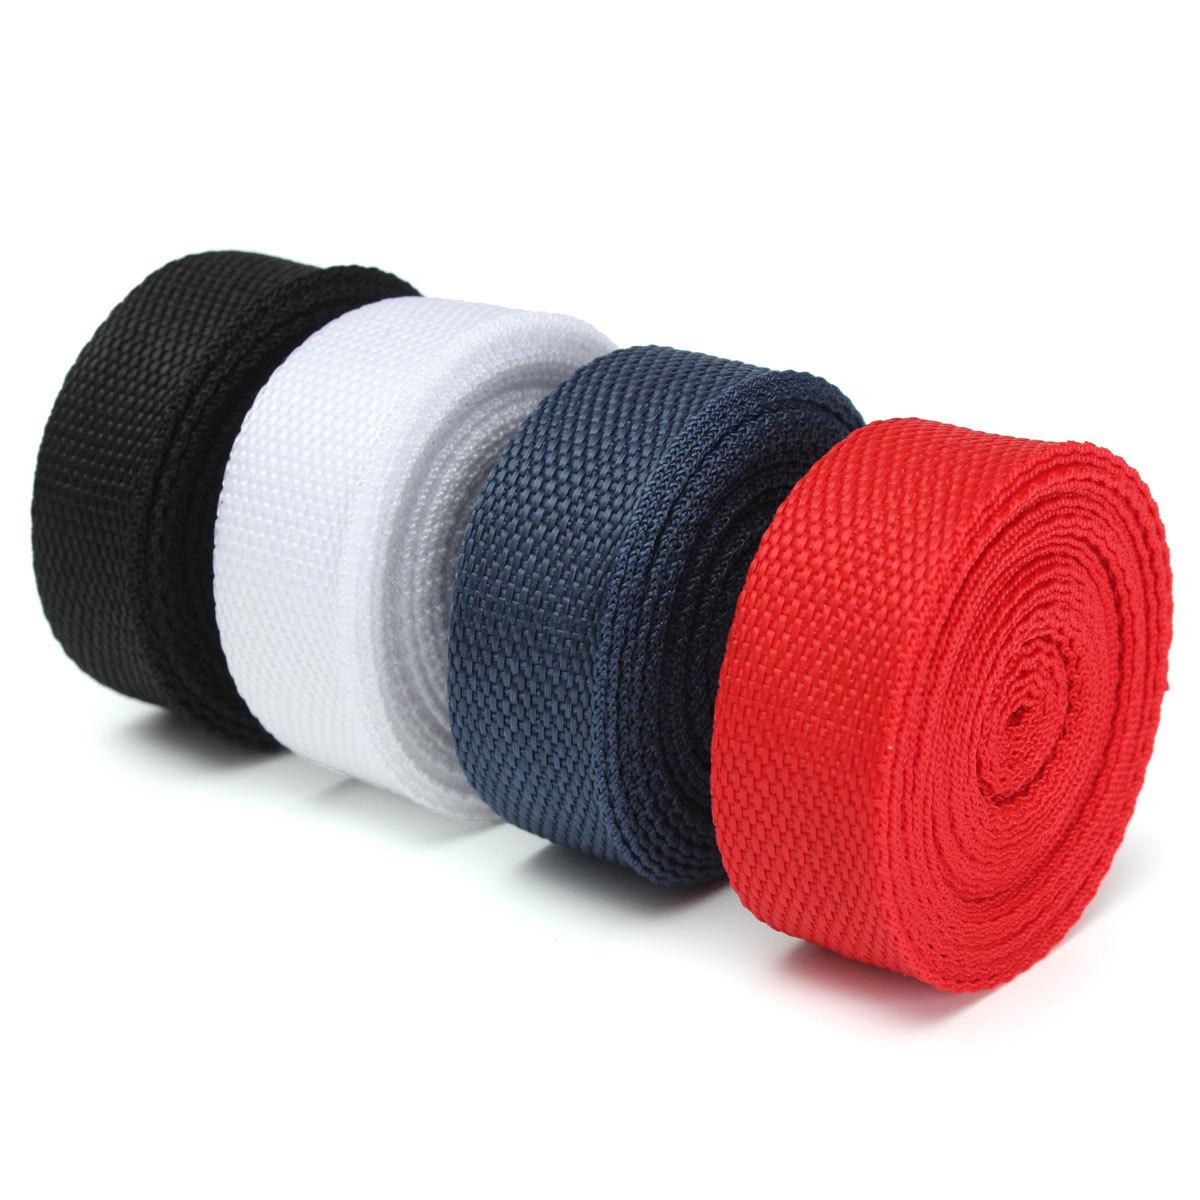 25mmx4m Roll Nylon Fabric Tape Strap Webbing Bag Binding